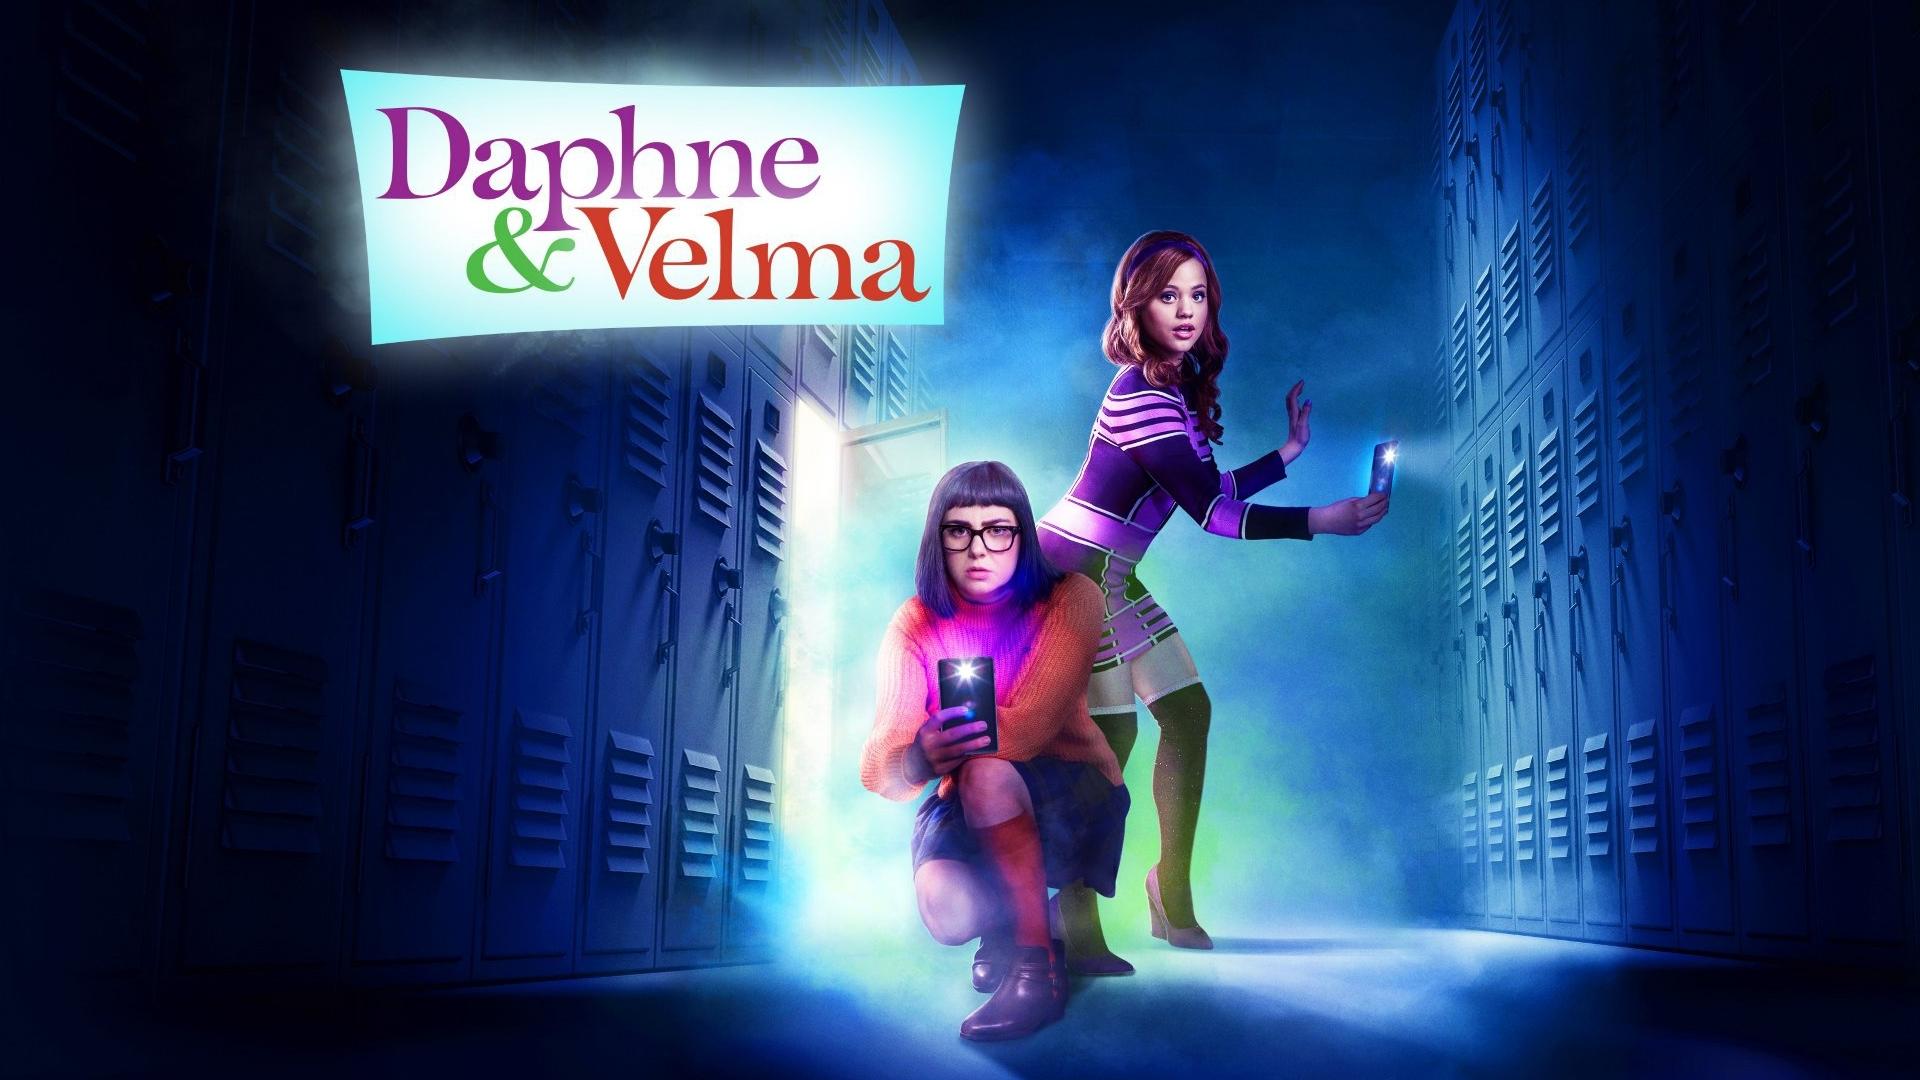 Daphne & Velma Daphne & Velma